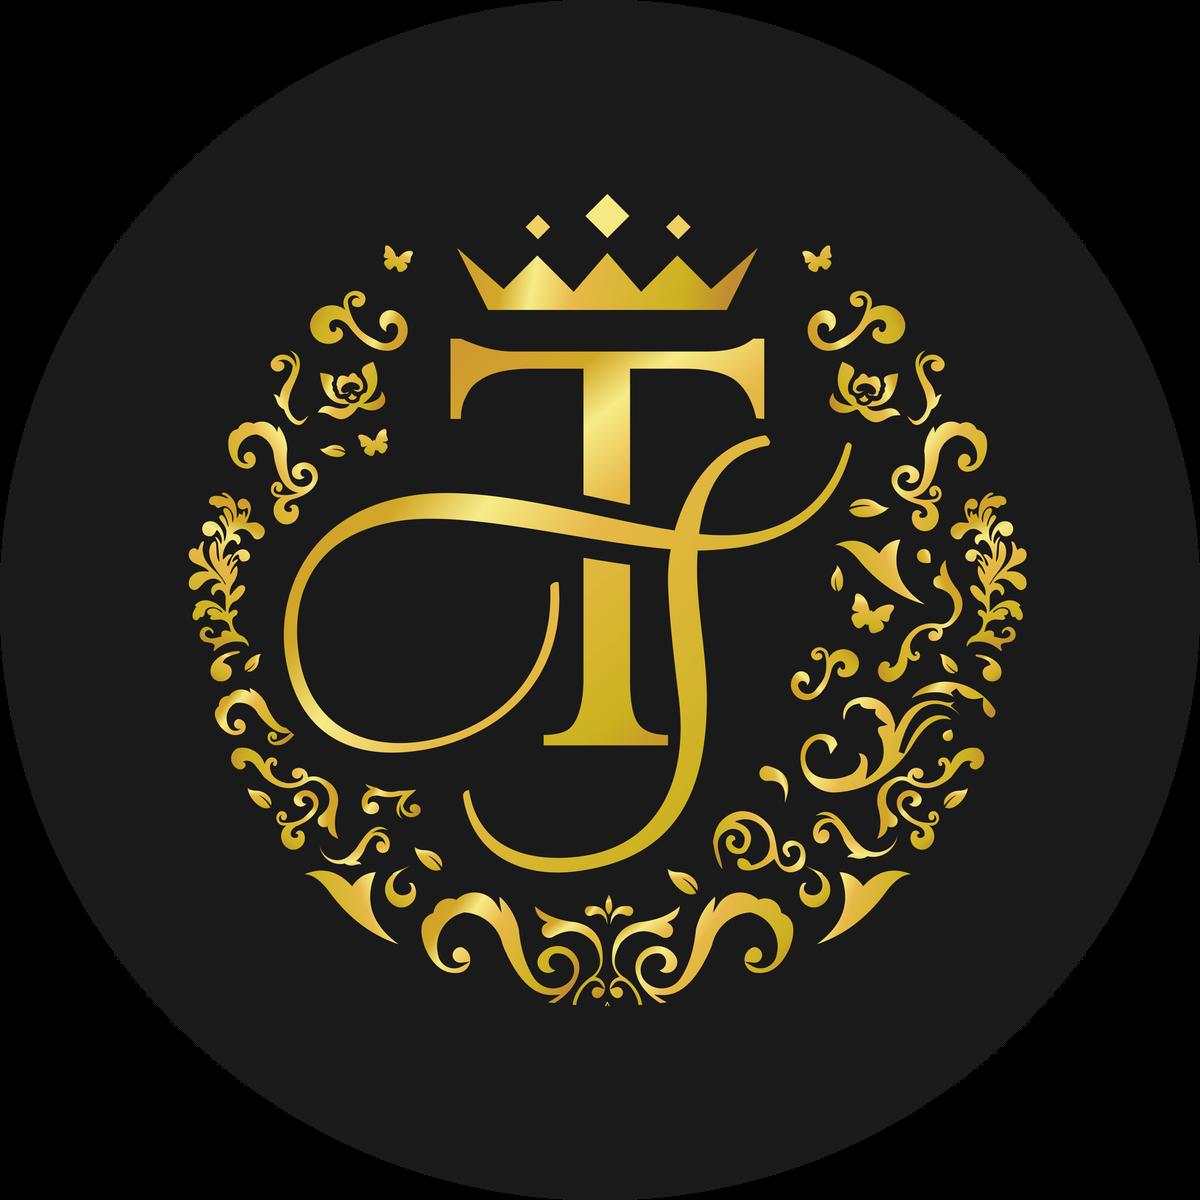 Logo and brand identity pack design